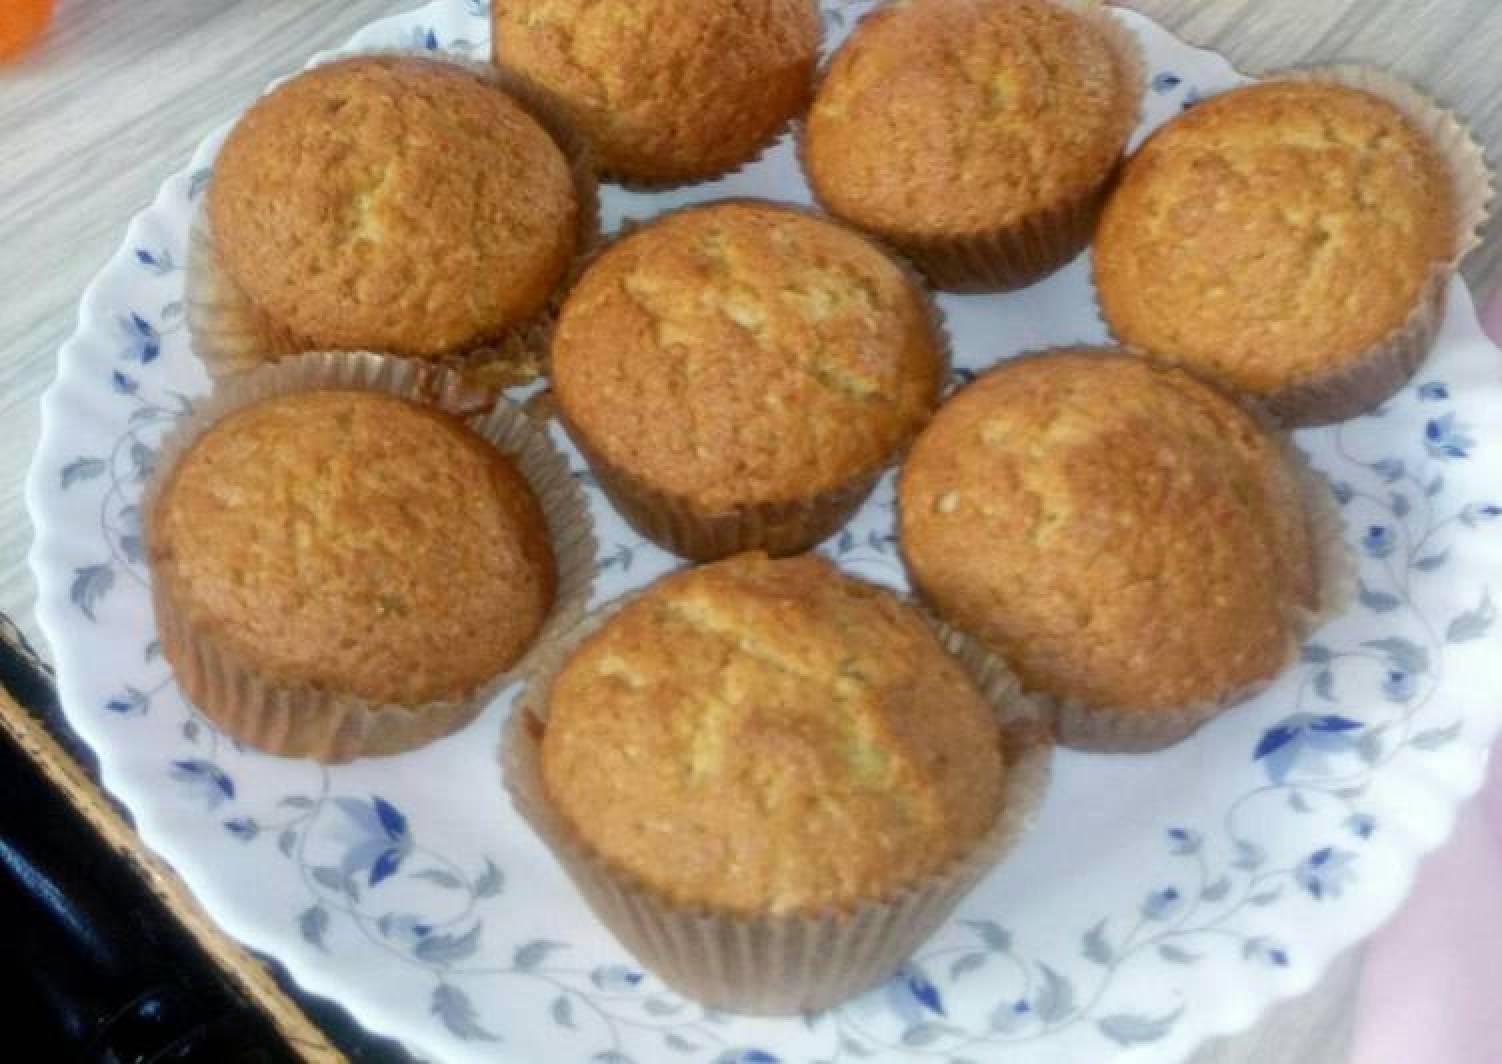 Sultanas/Raisins vanilla cupcakes